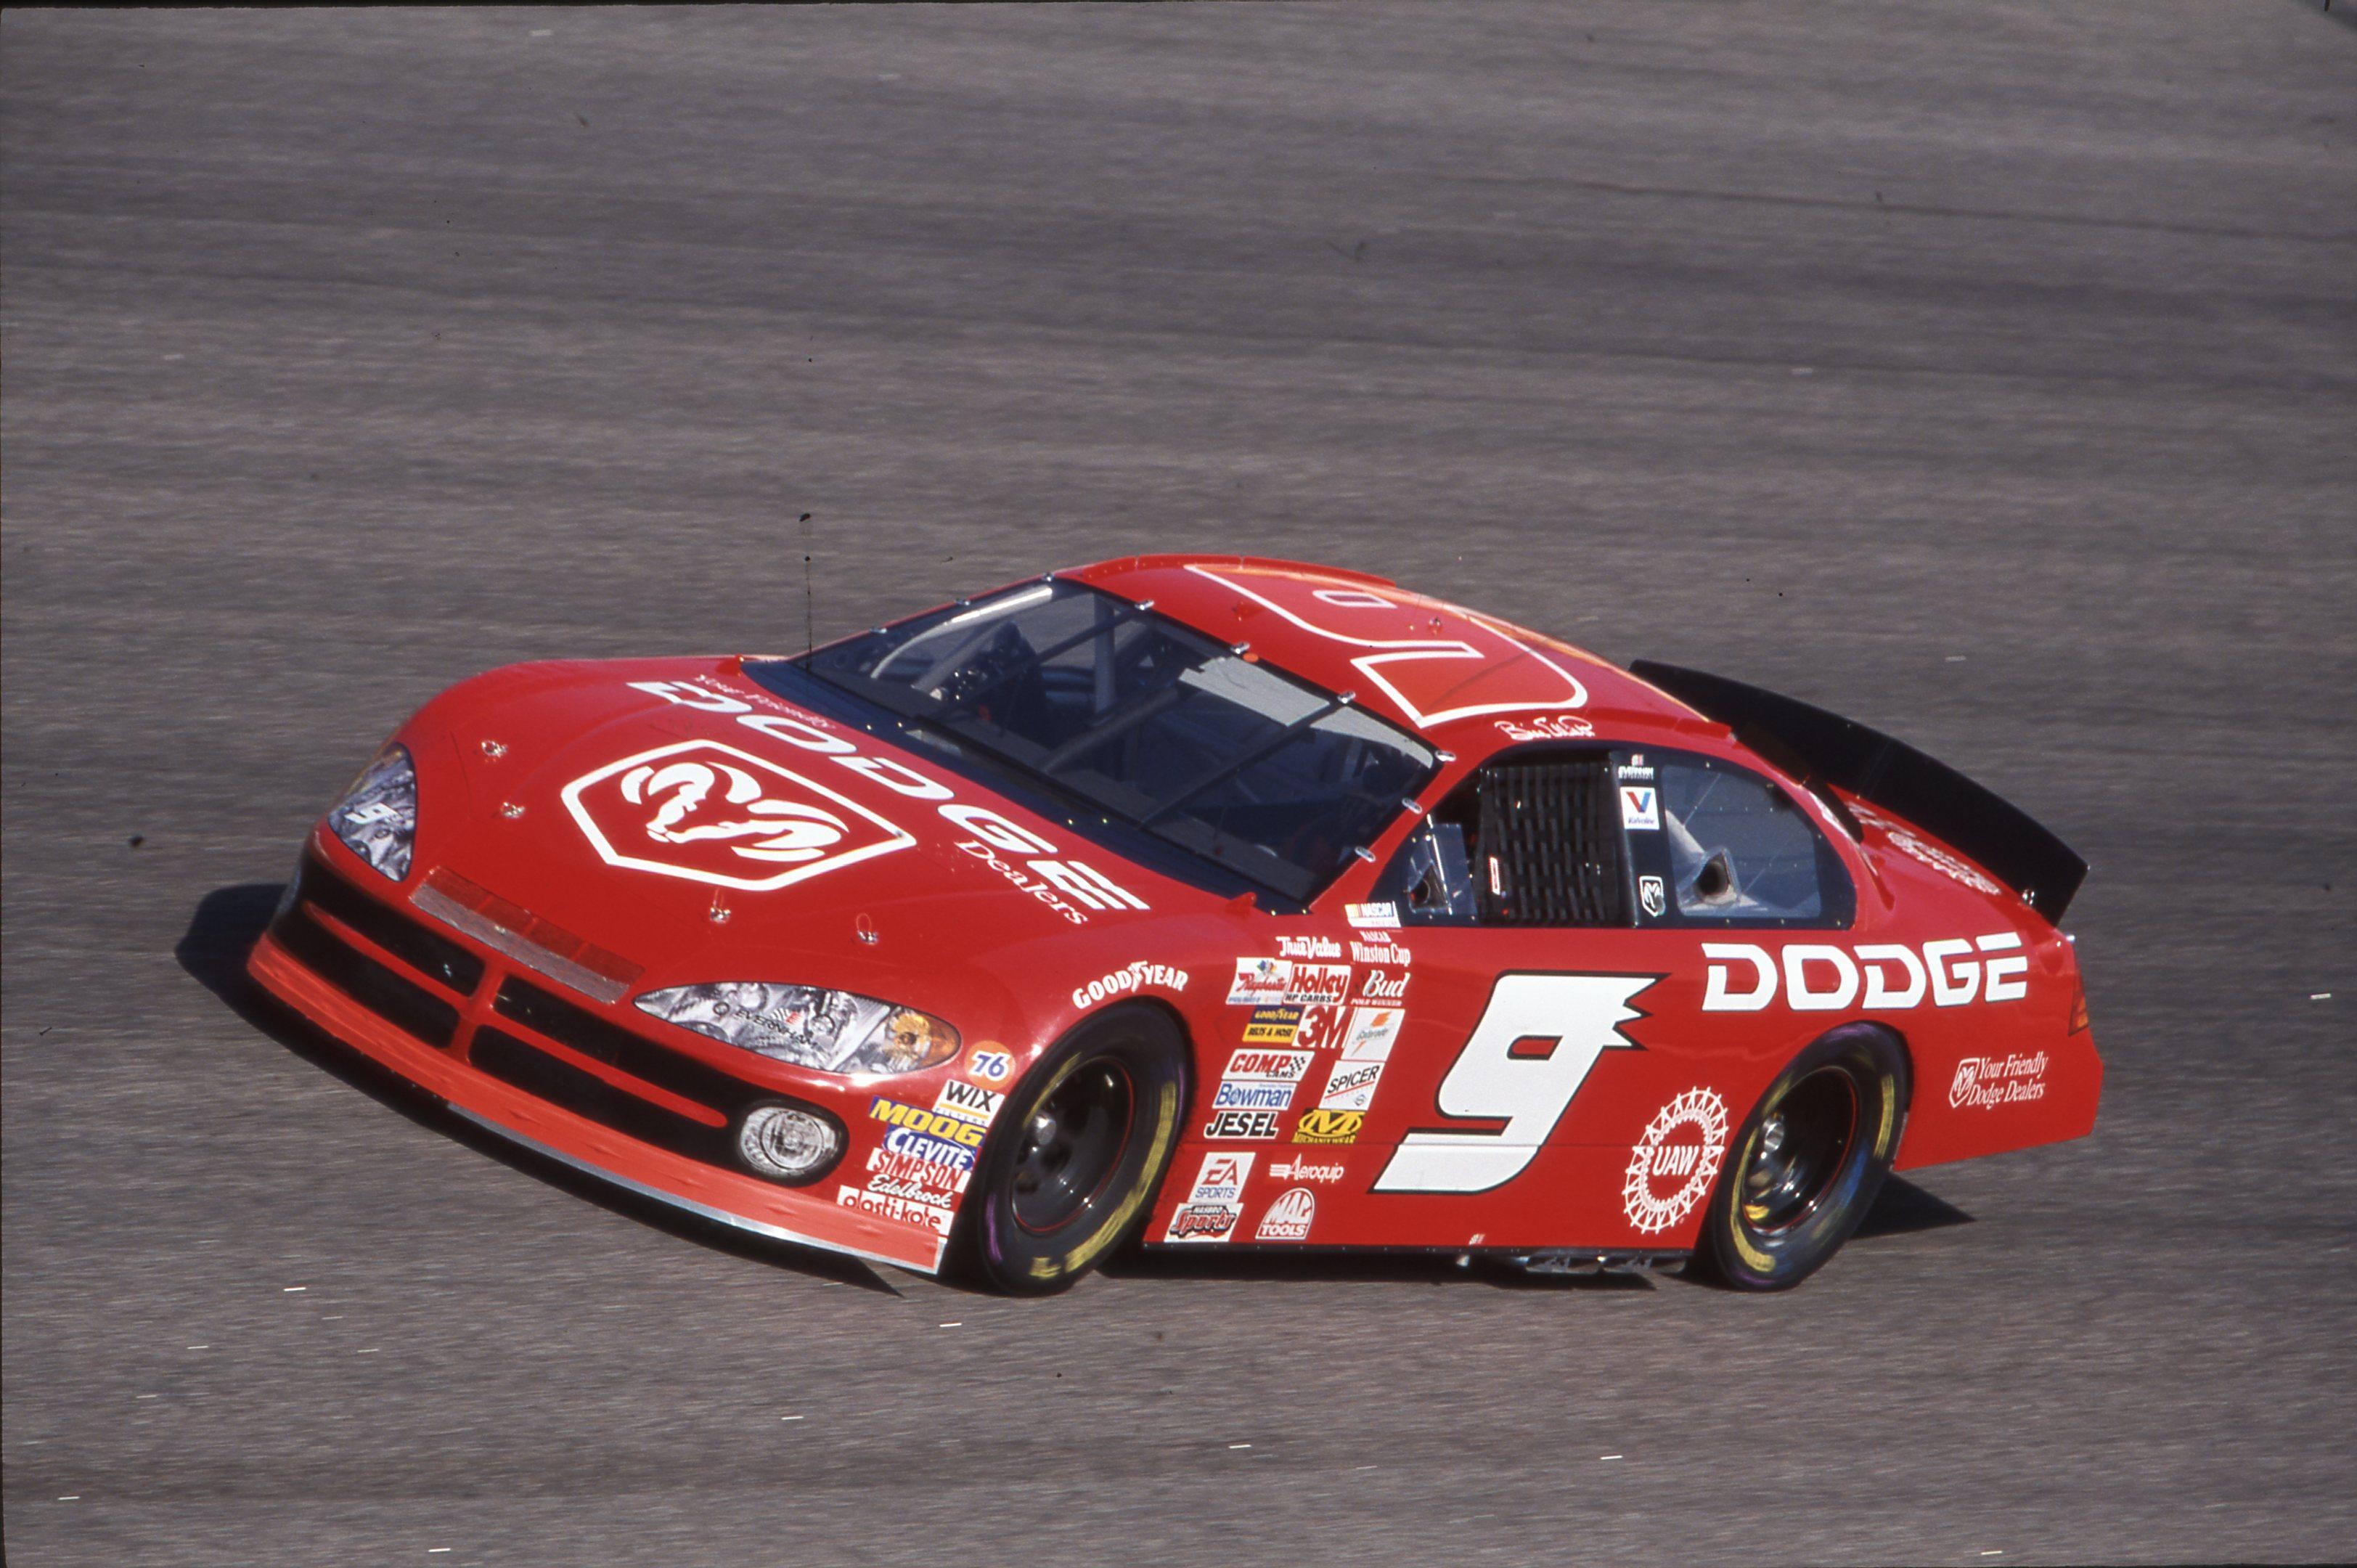 Bill on 1991 Dodge Daytona